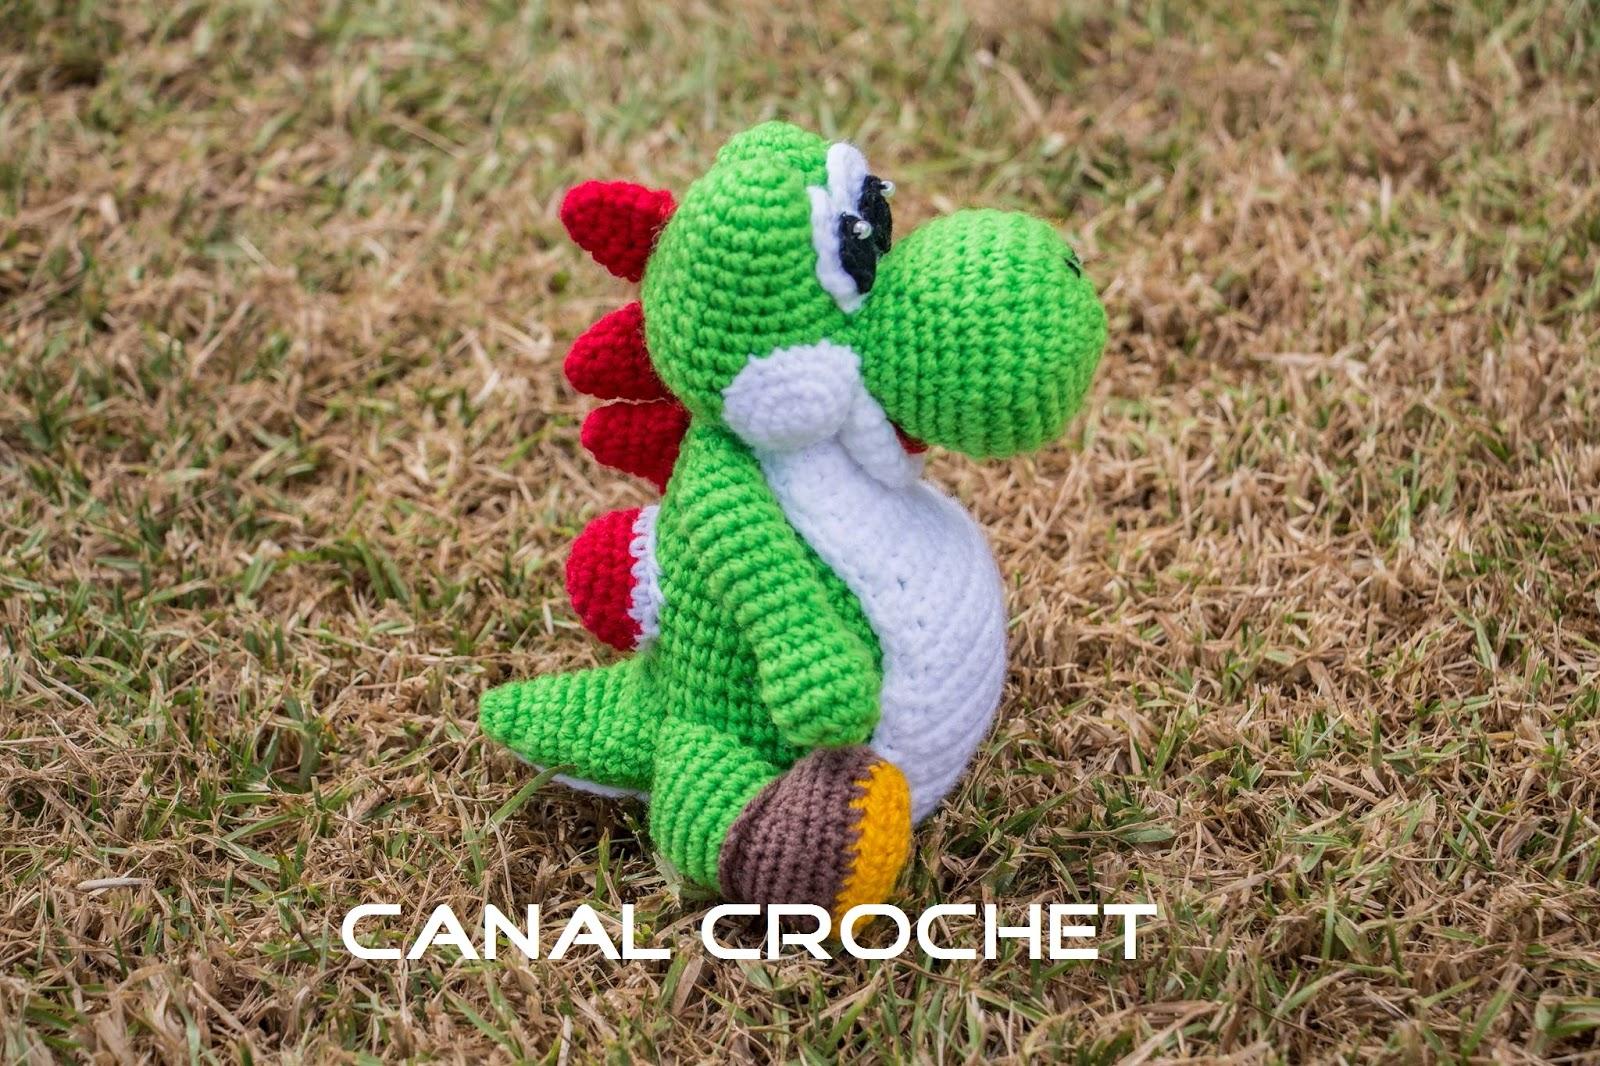 CANAL CROCHET: Yoshi amigurumi patron libre.